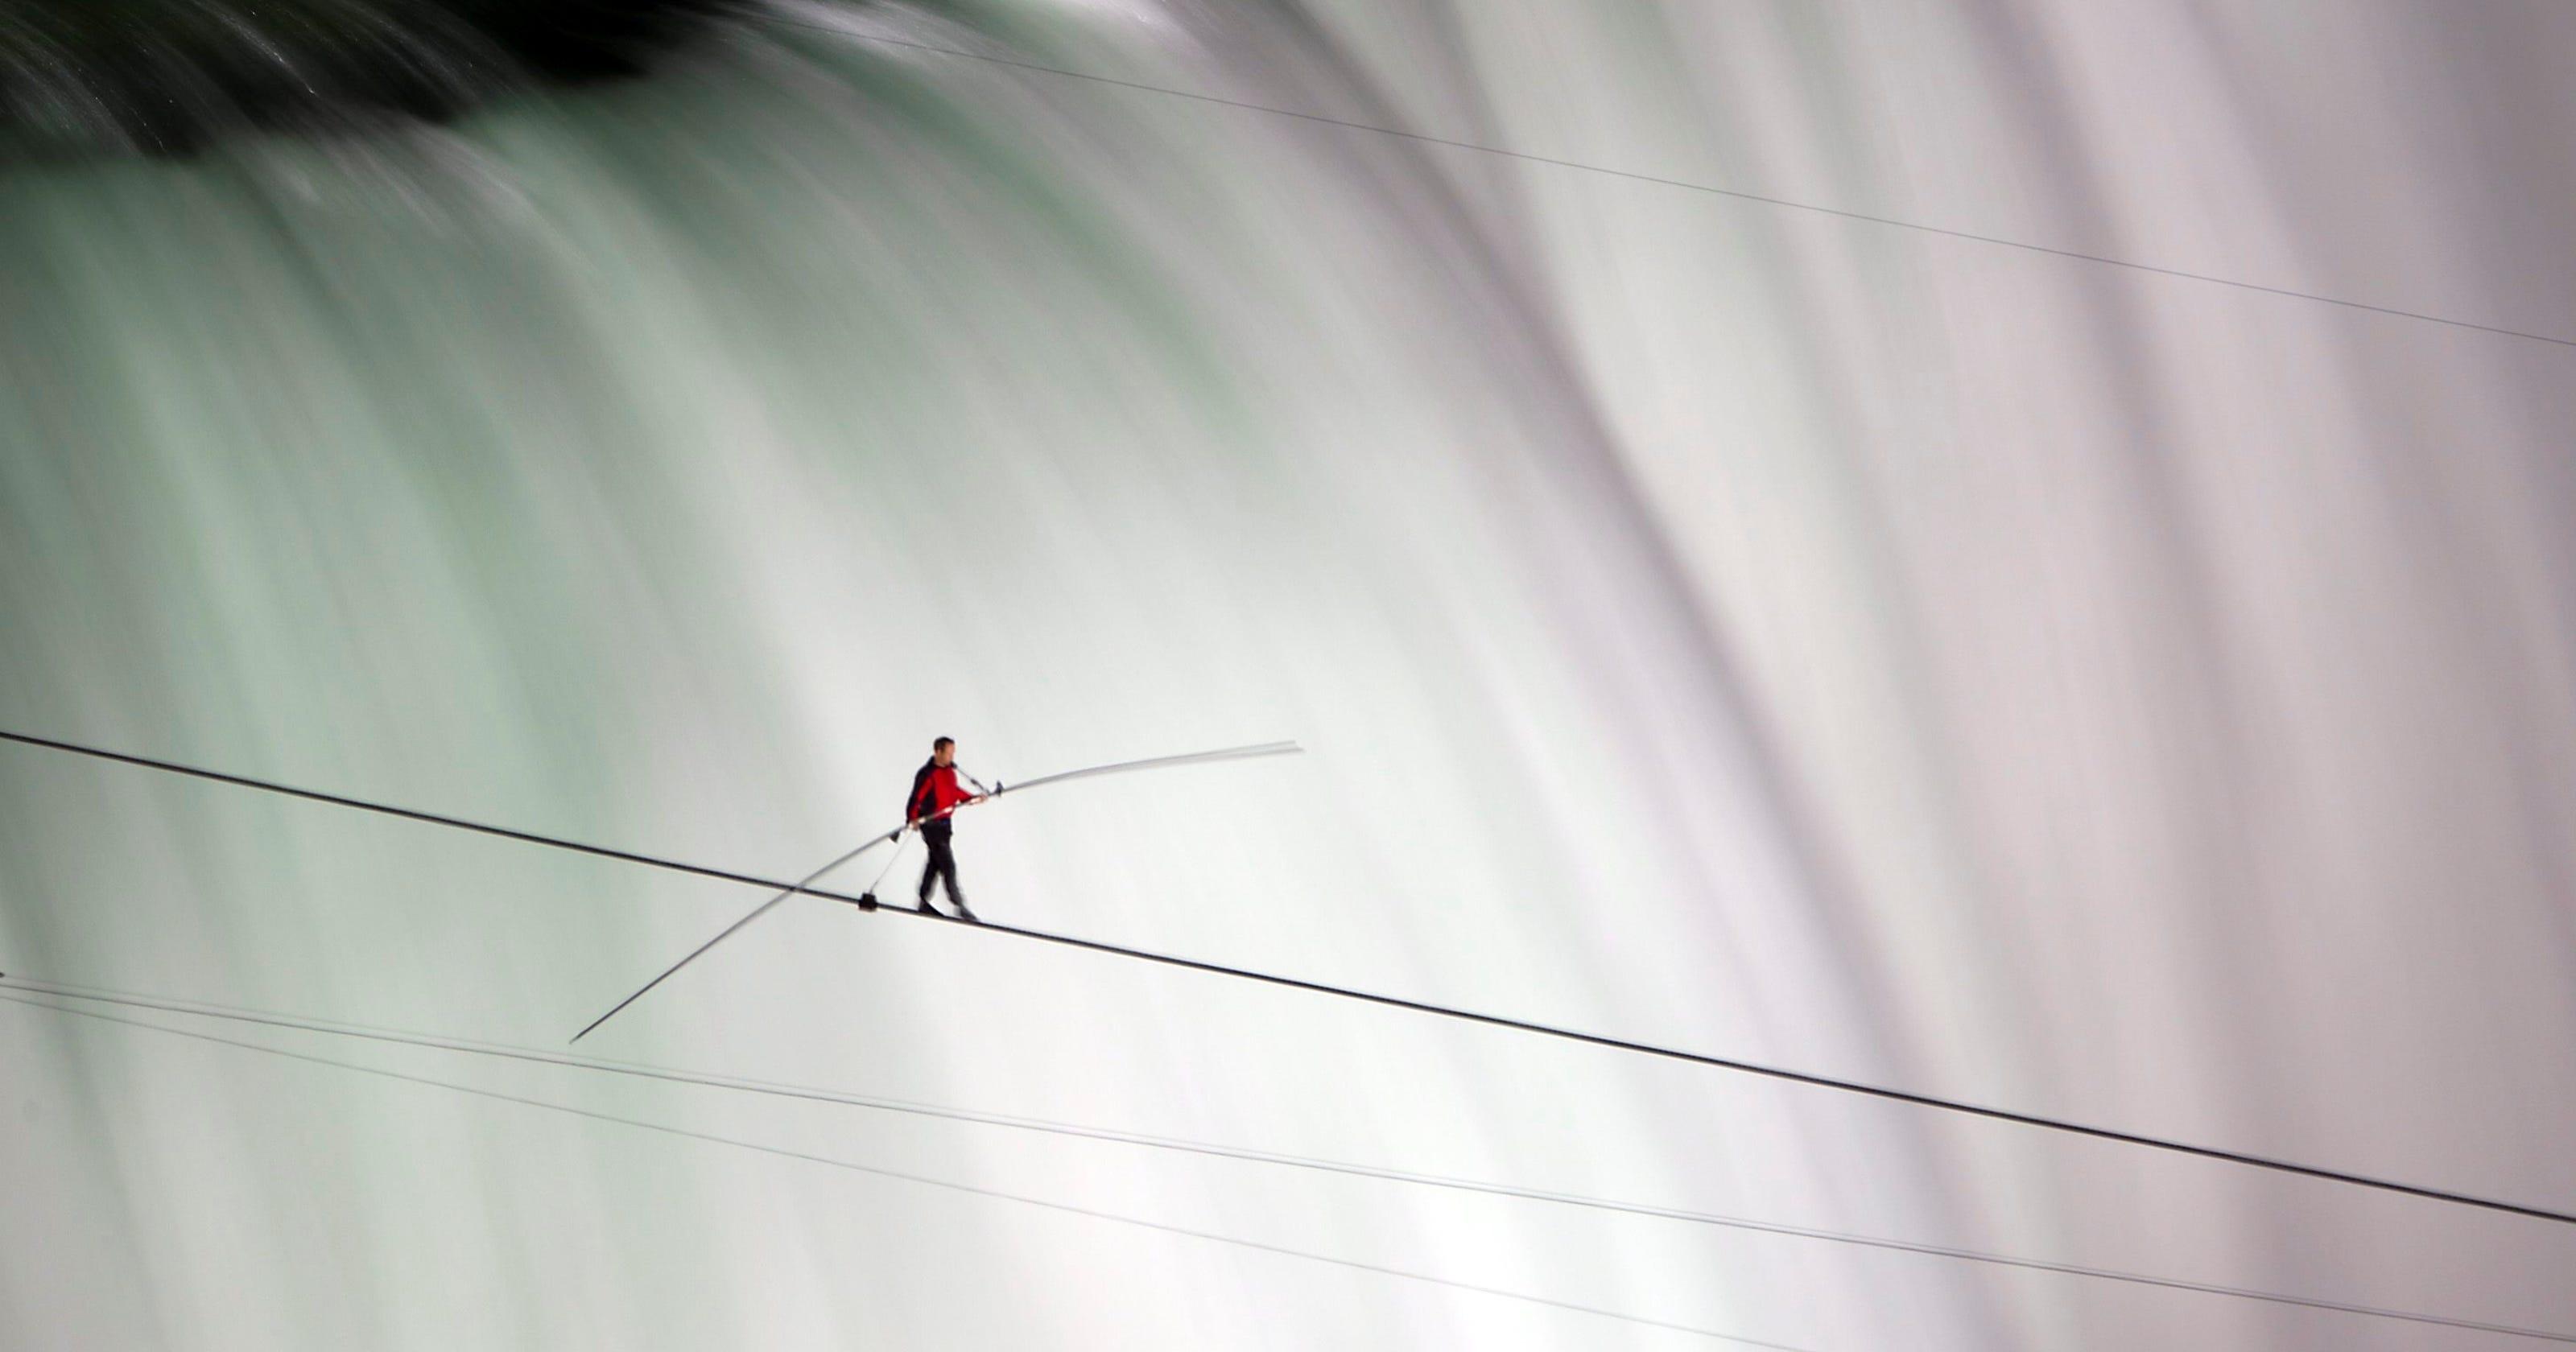 Wallenda's canyon walk will be daring, but not so Grand